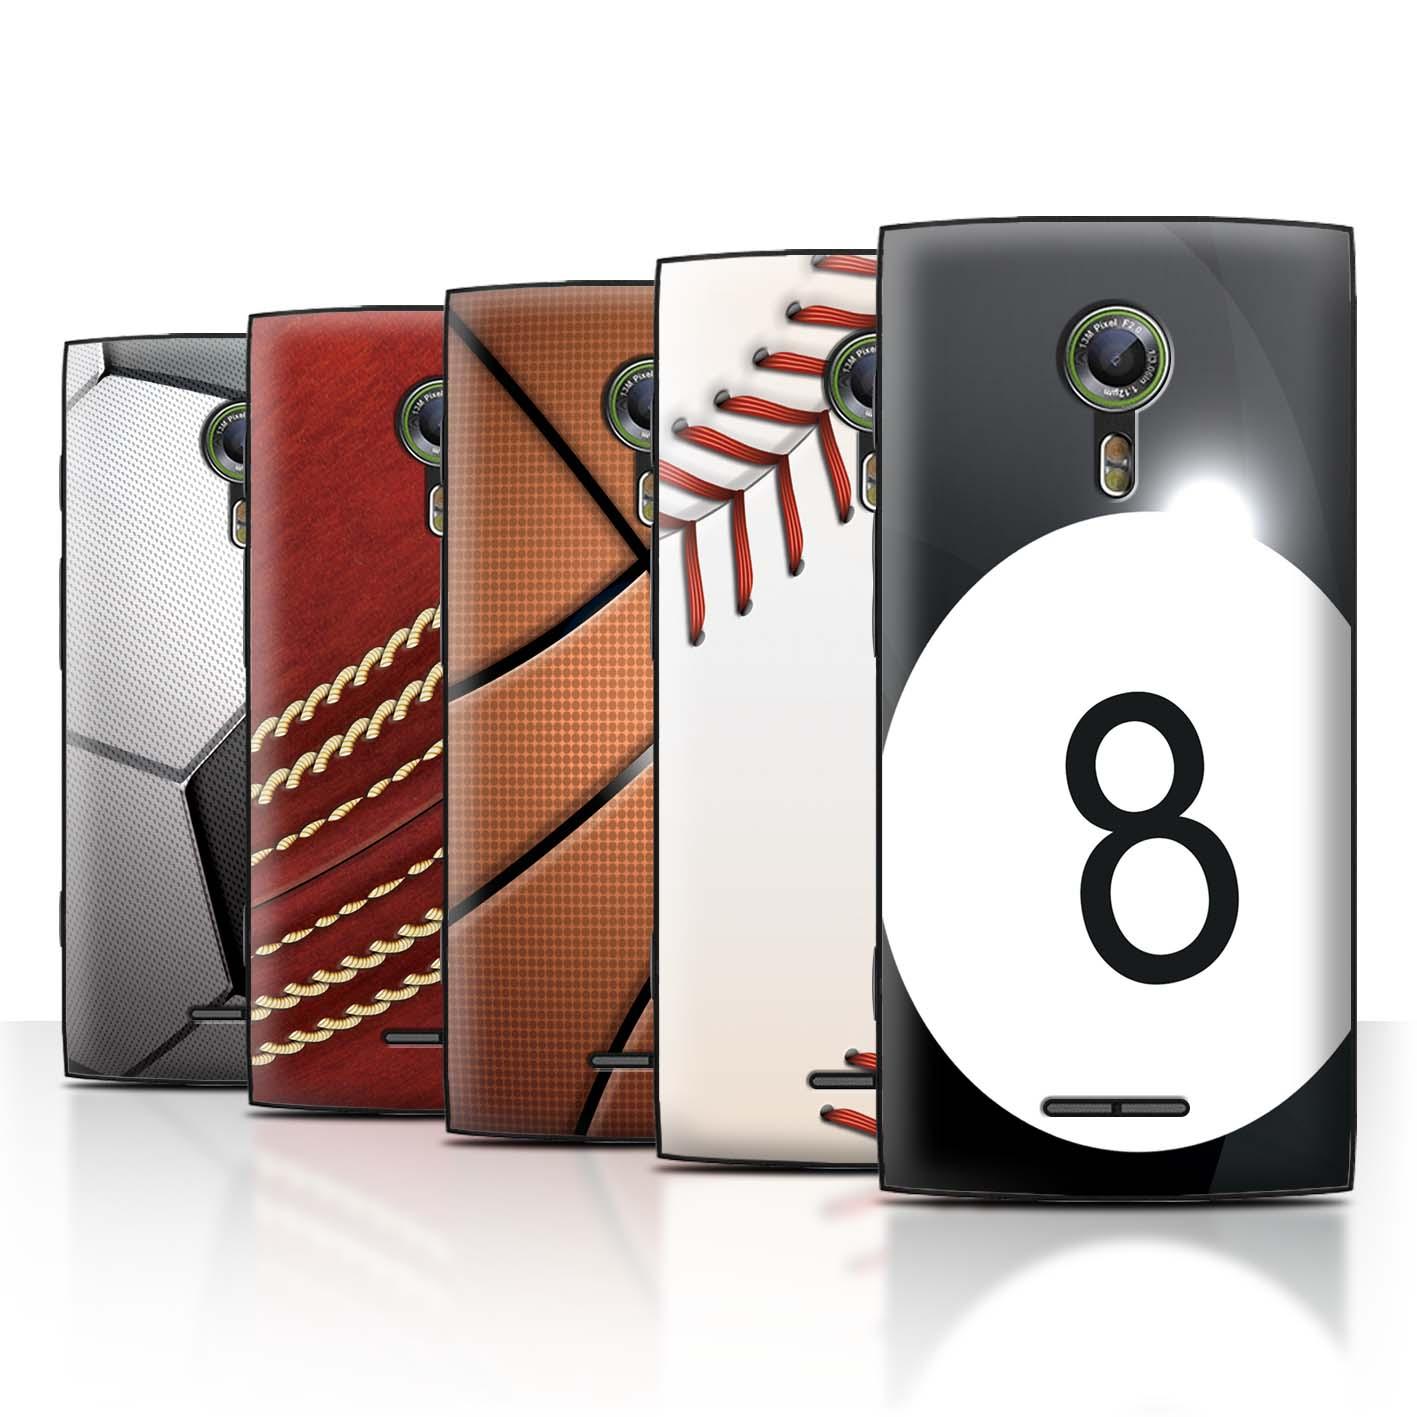 STUFF4-Back-Case-Cover-Skin-for-Alcatel-Flash-2-Sports-Balls